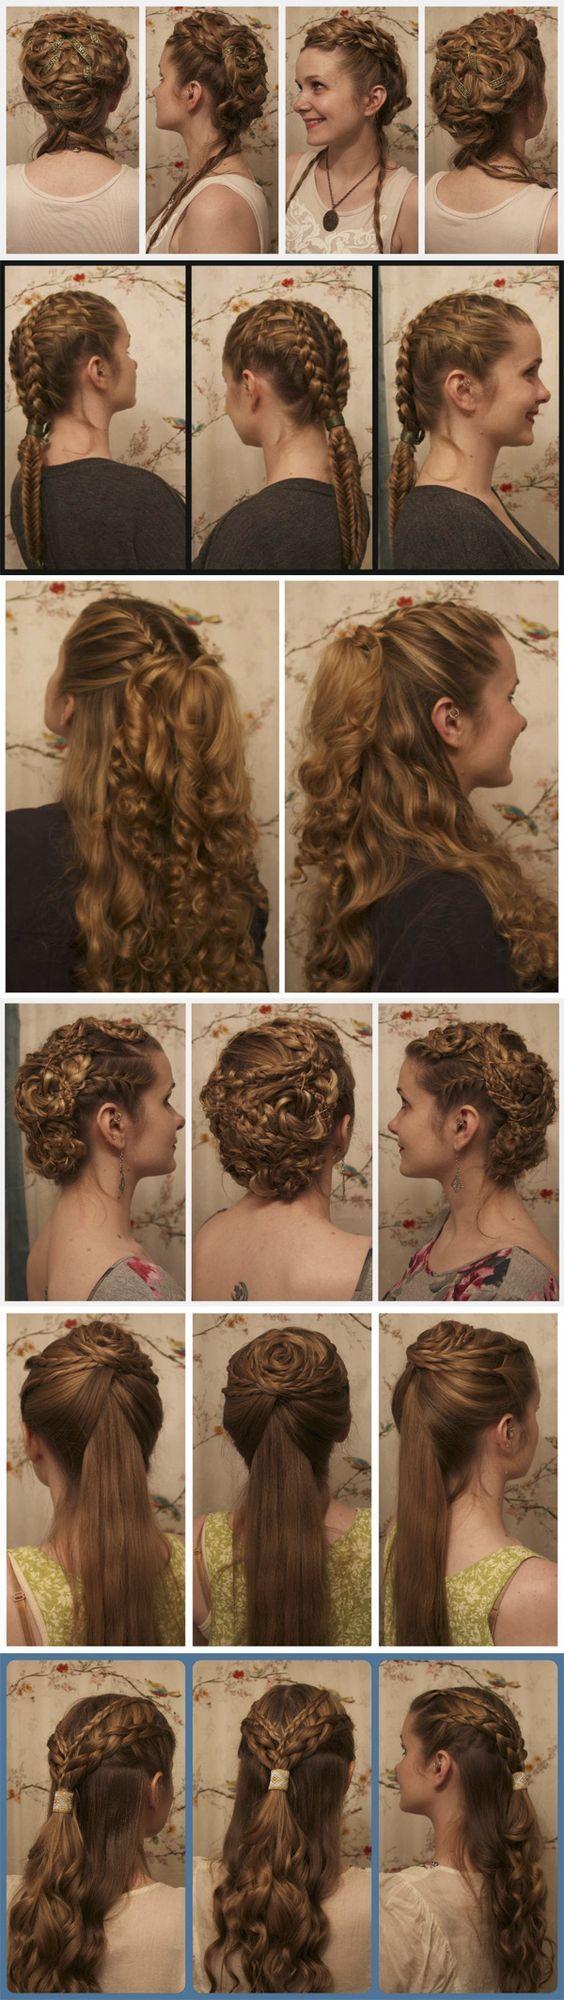 Very intricate hair styles                                                                                                                                                                                 Plus